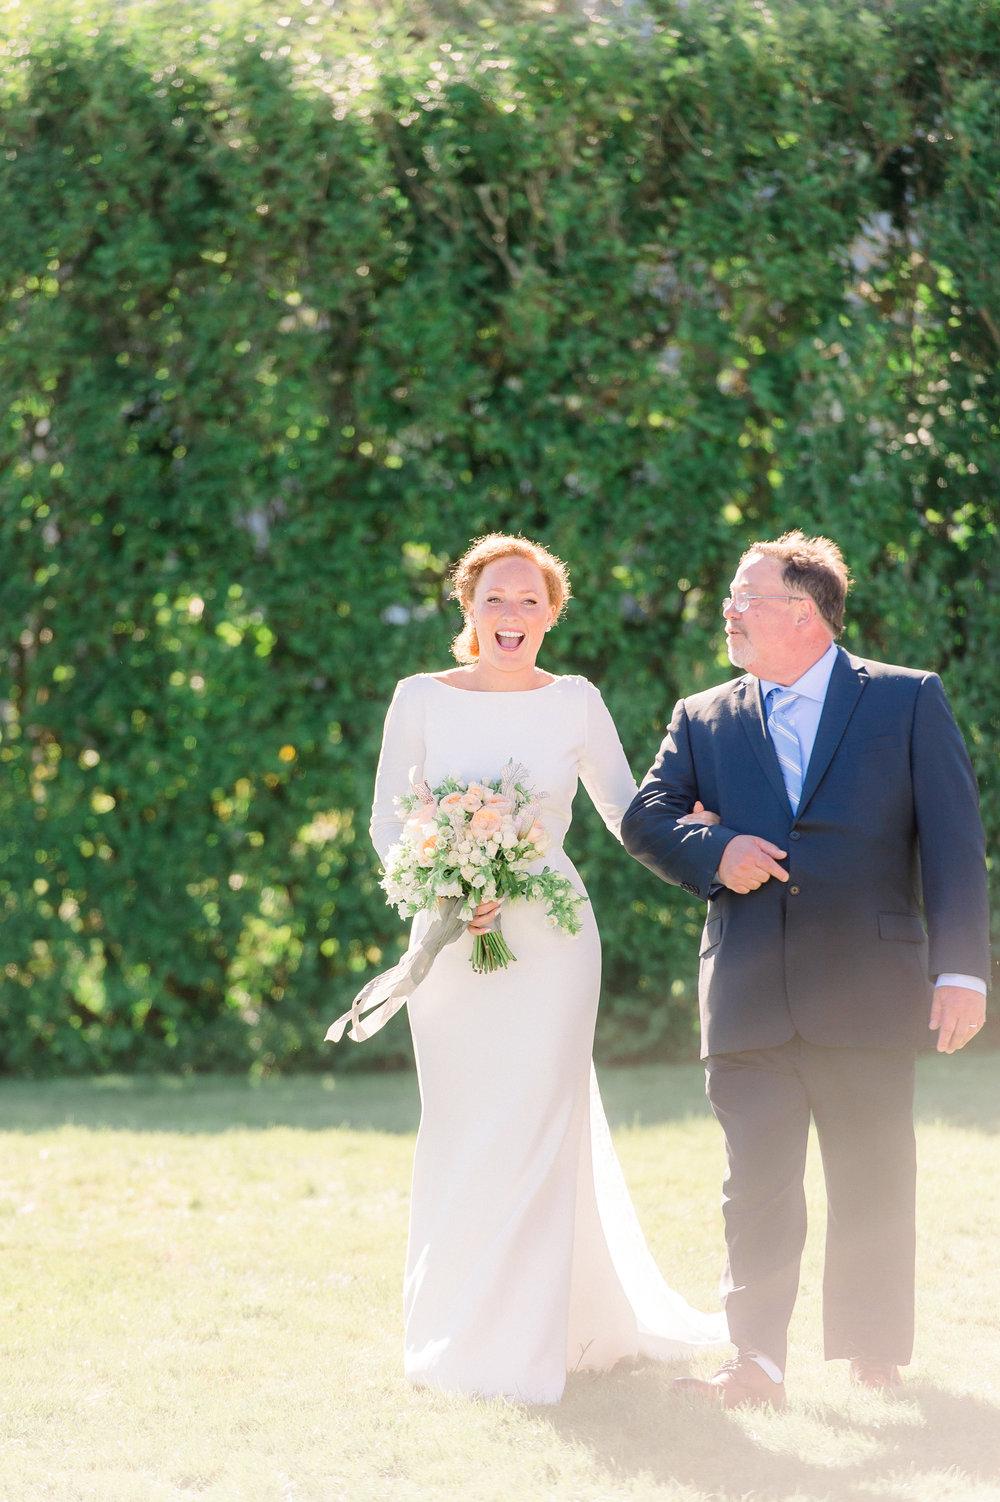 Whit & Rob's Nantucket Wedding-64.jpg